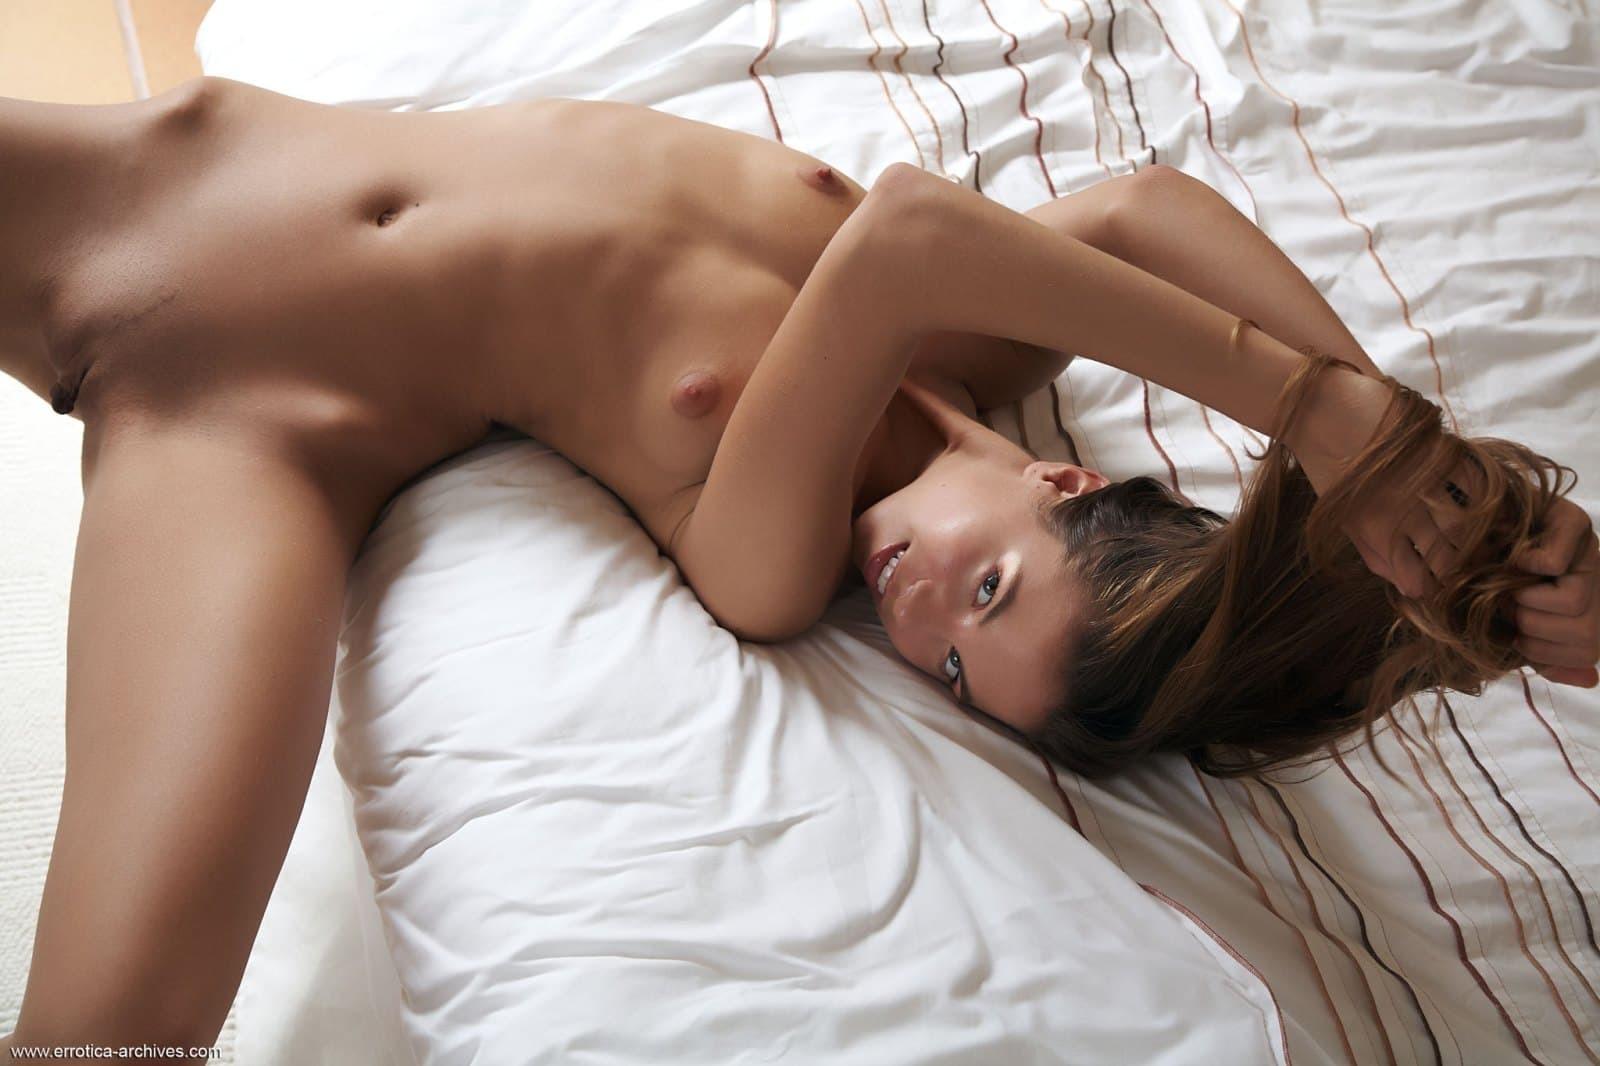 Тощая с бритой мандой на кровати - фото